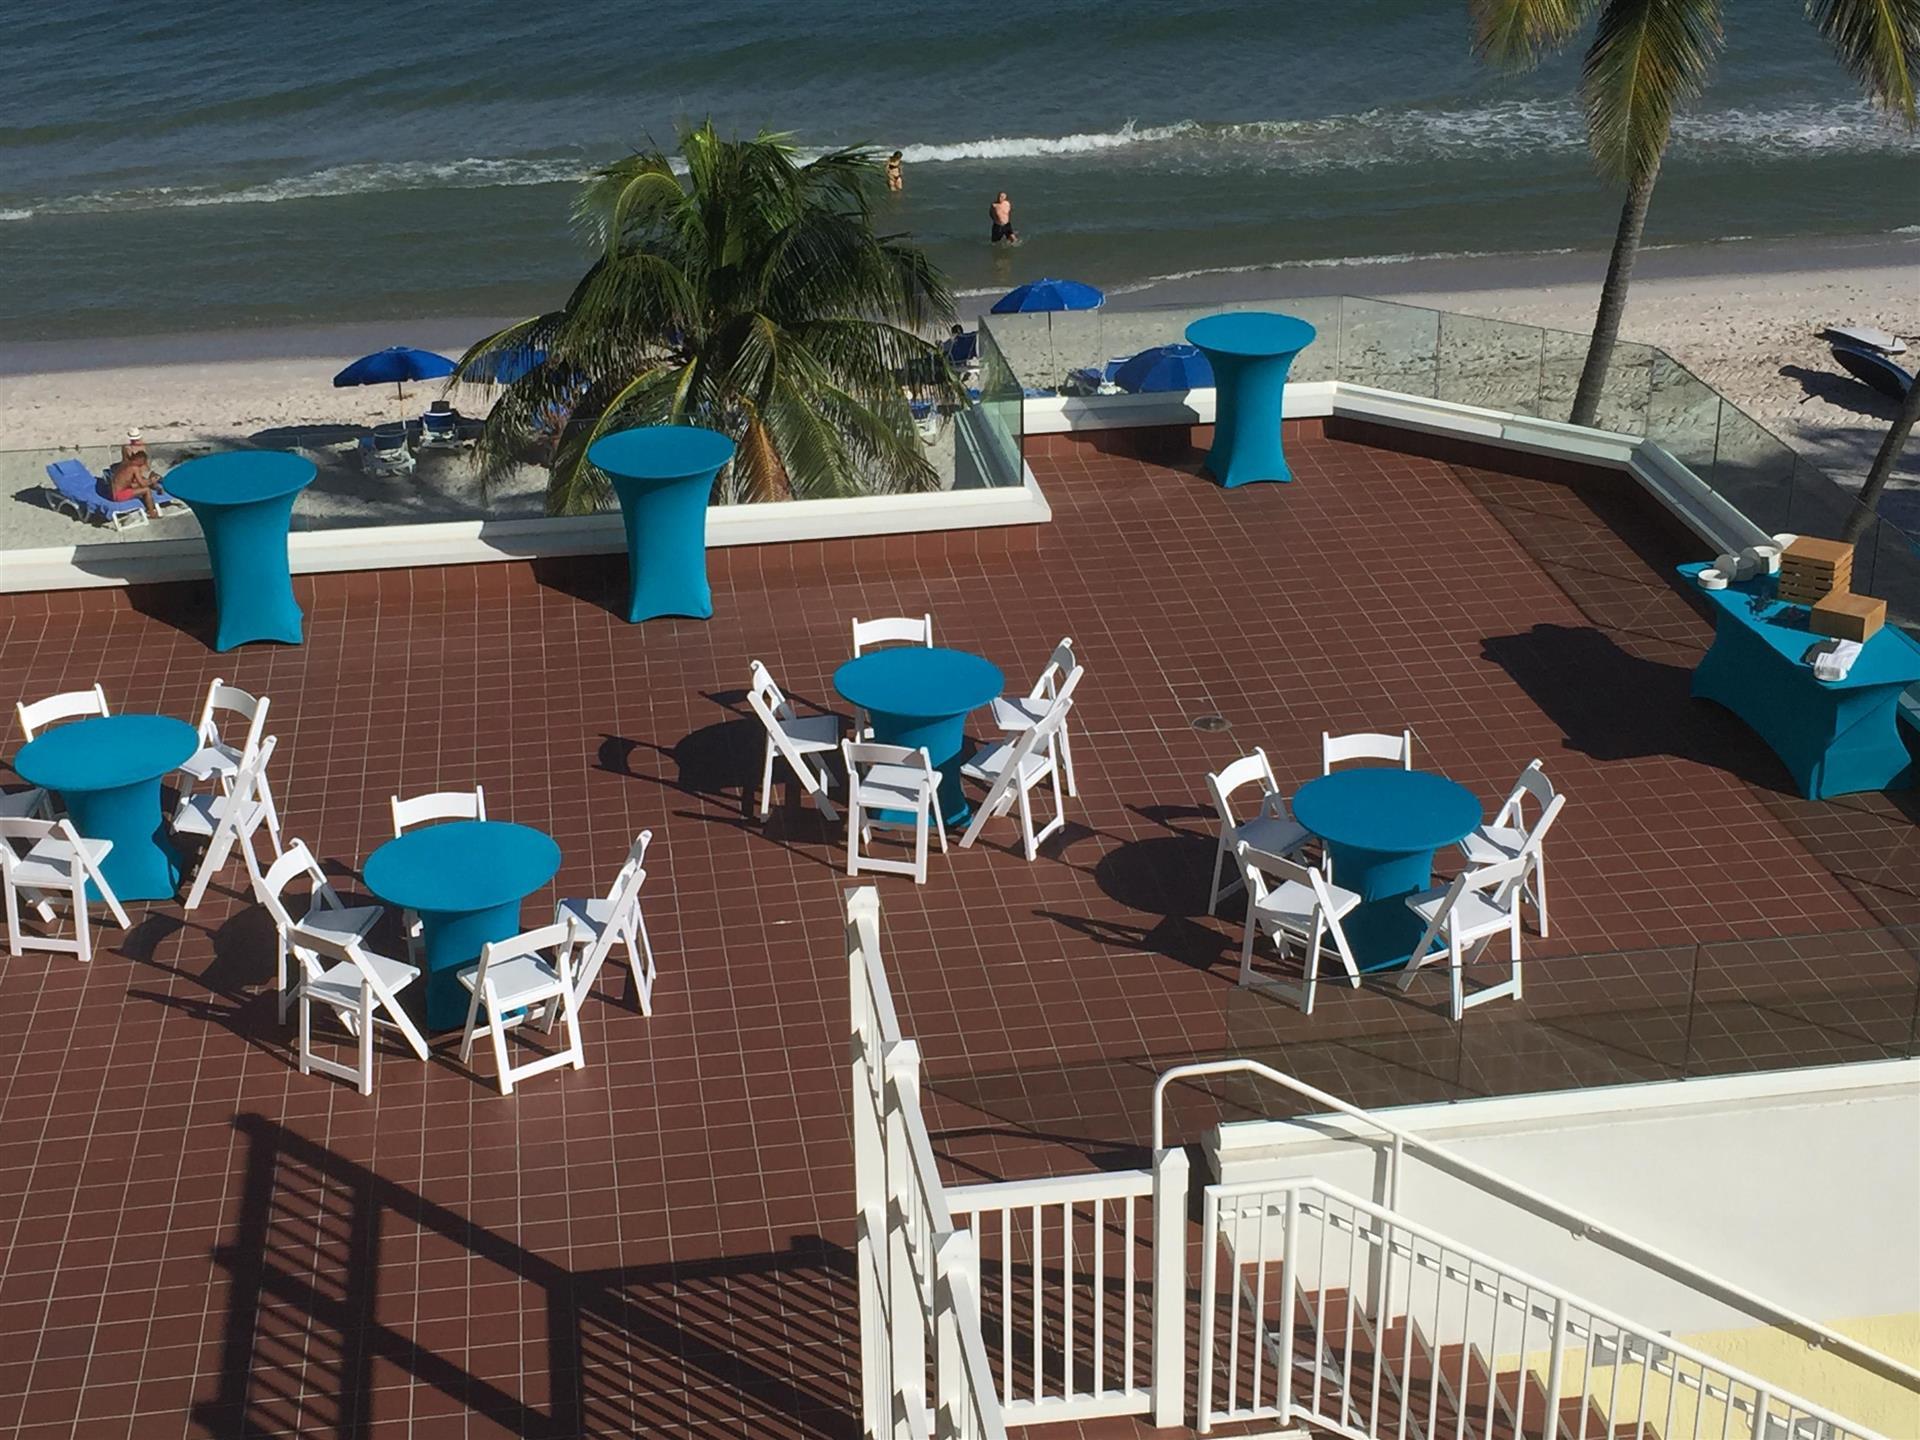 Meetings And Events At Pelican Grand Beach Resort Fort Lauderdale Fl Us